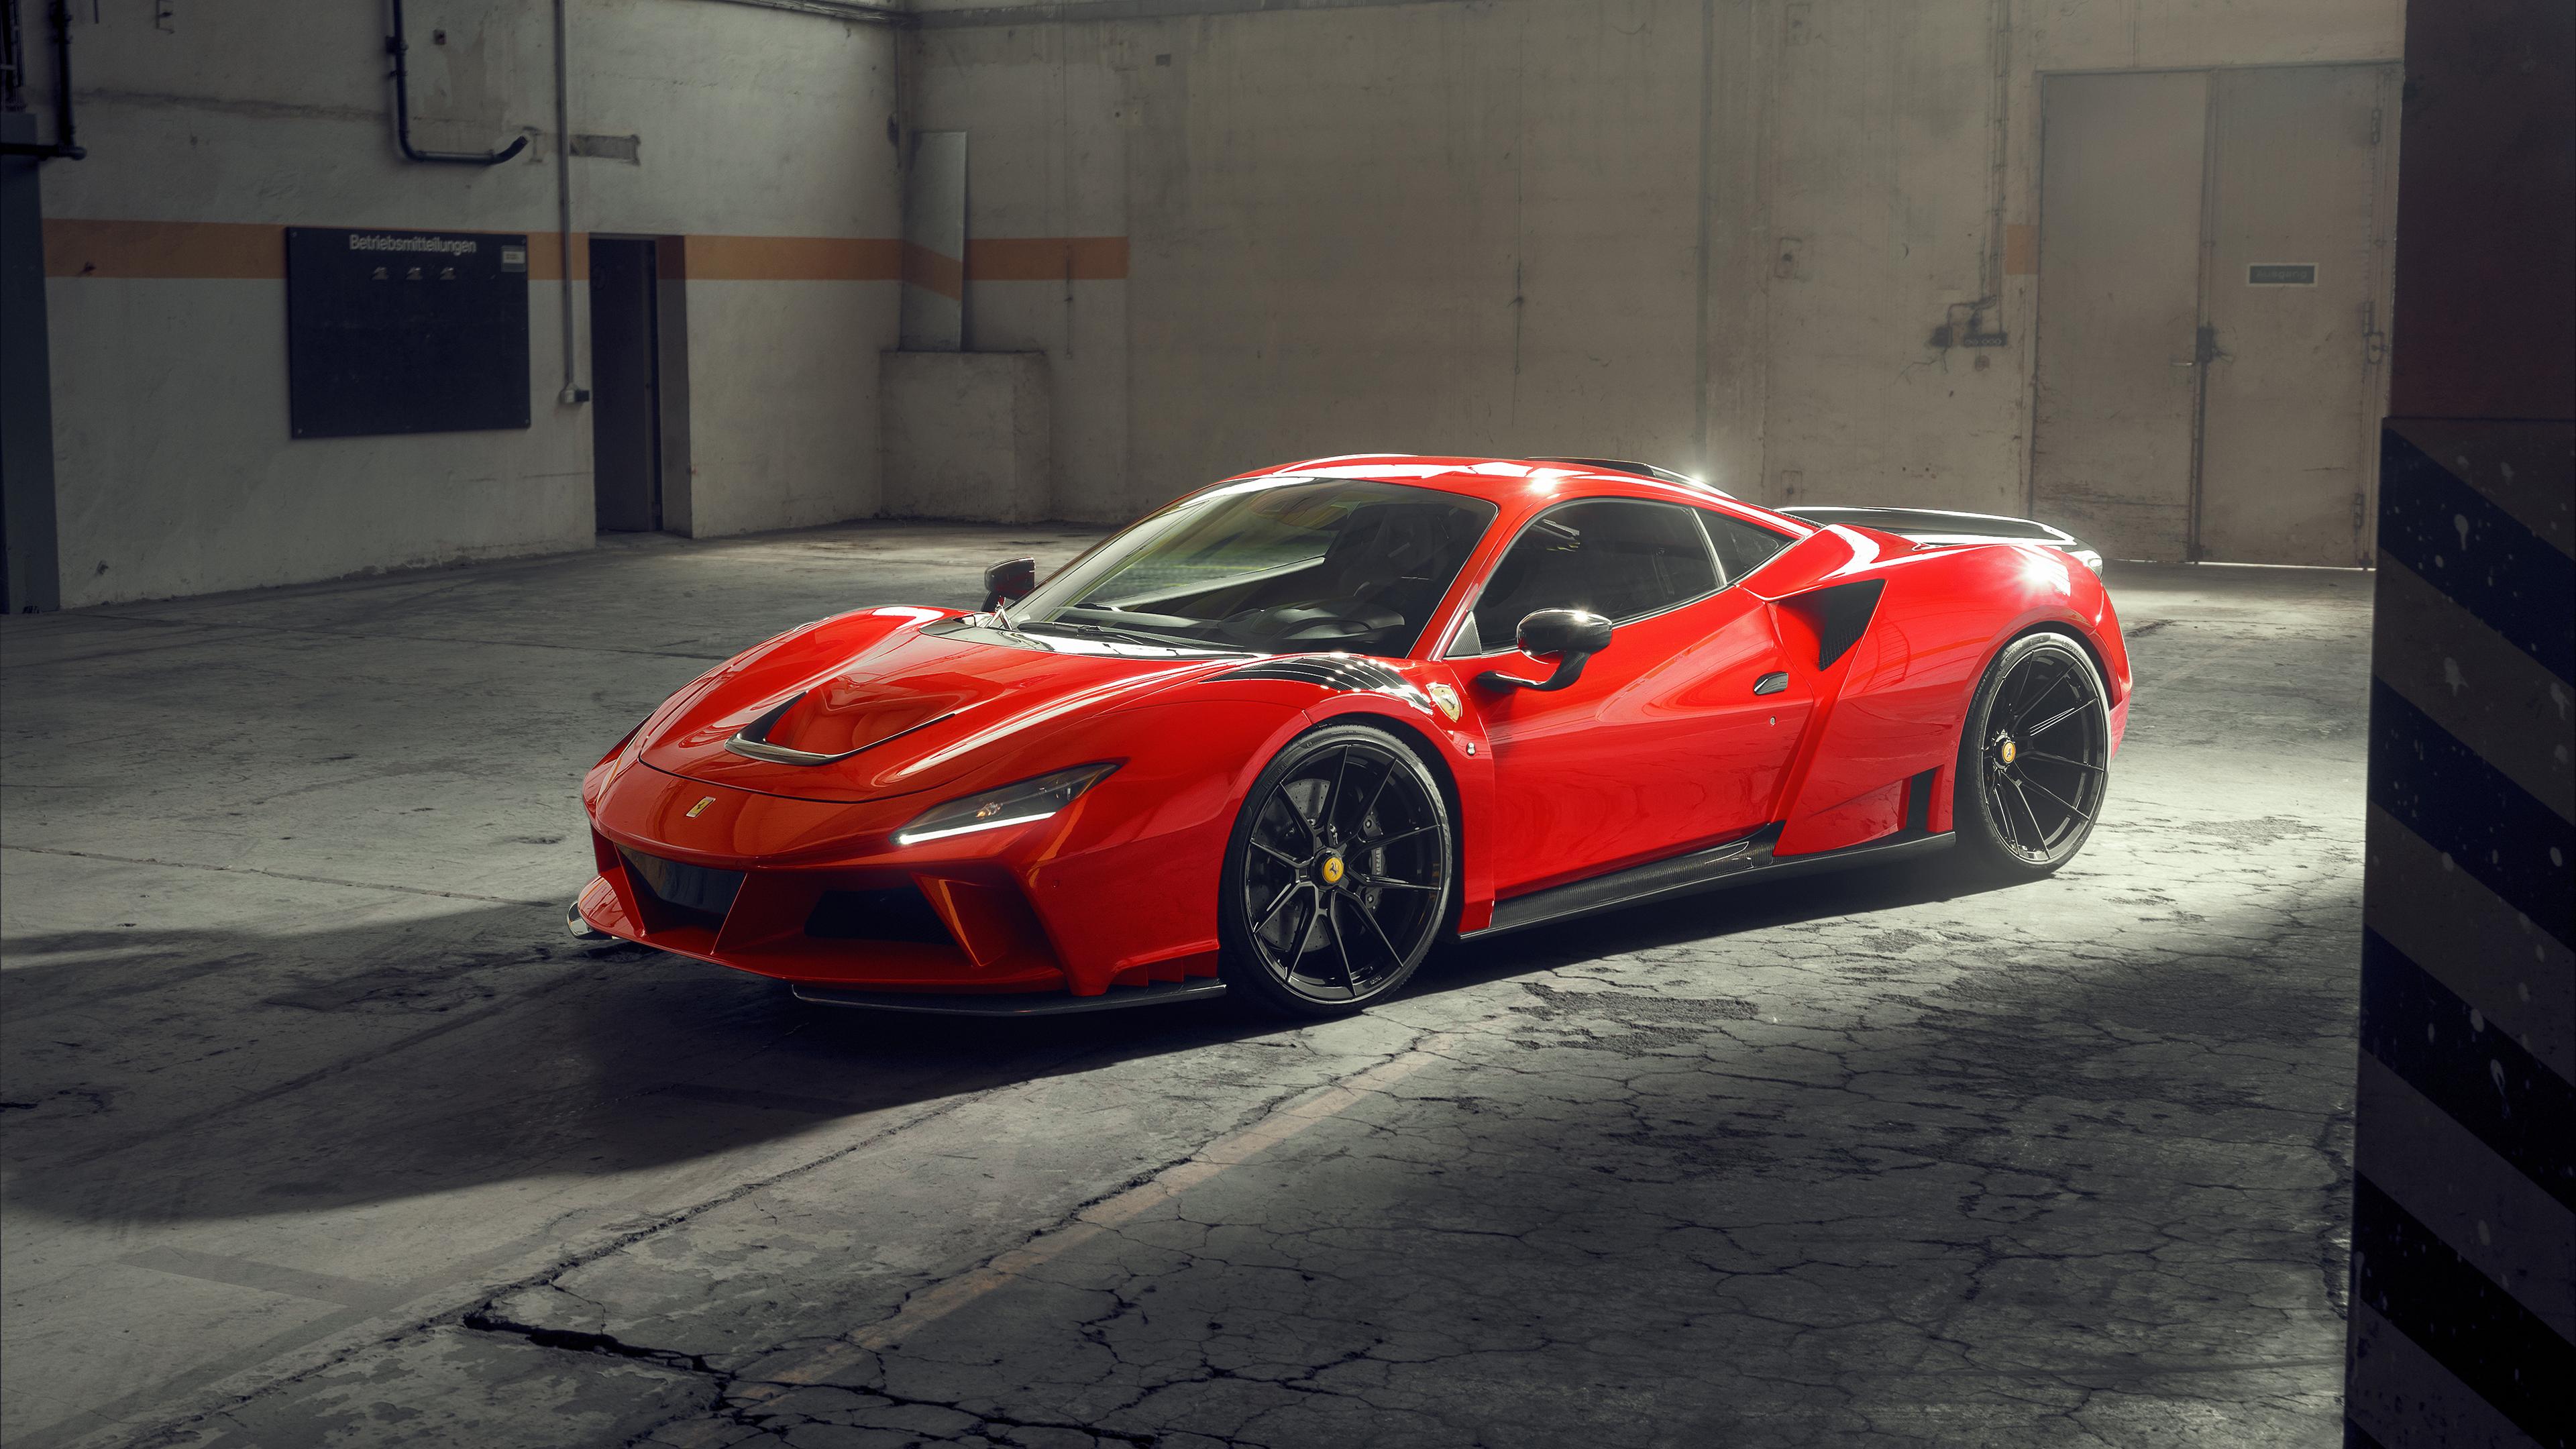 Ferrari F8 Tributo Ferrari Car Supercars Italian Supercars Vehicle Novitec Red Cars Warehouse Natura 3840x2160